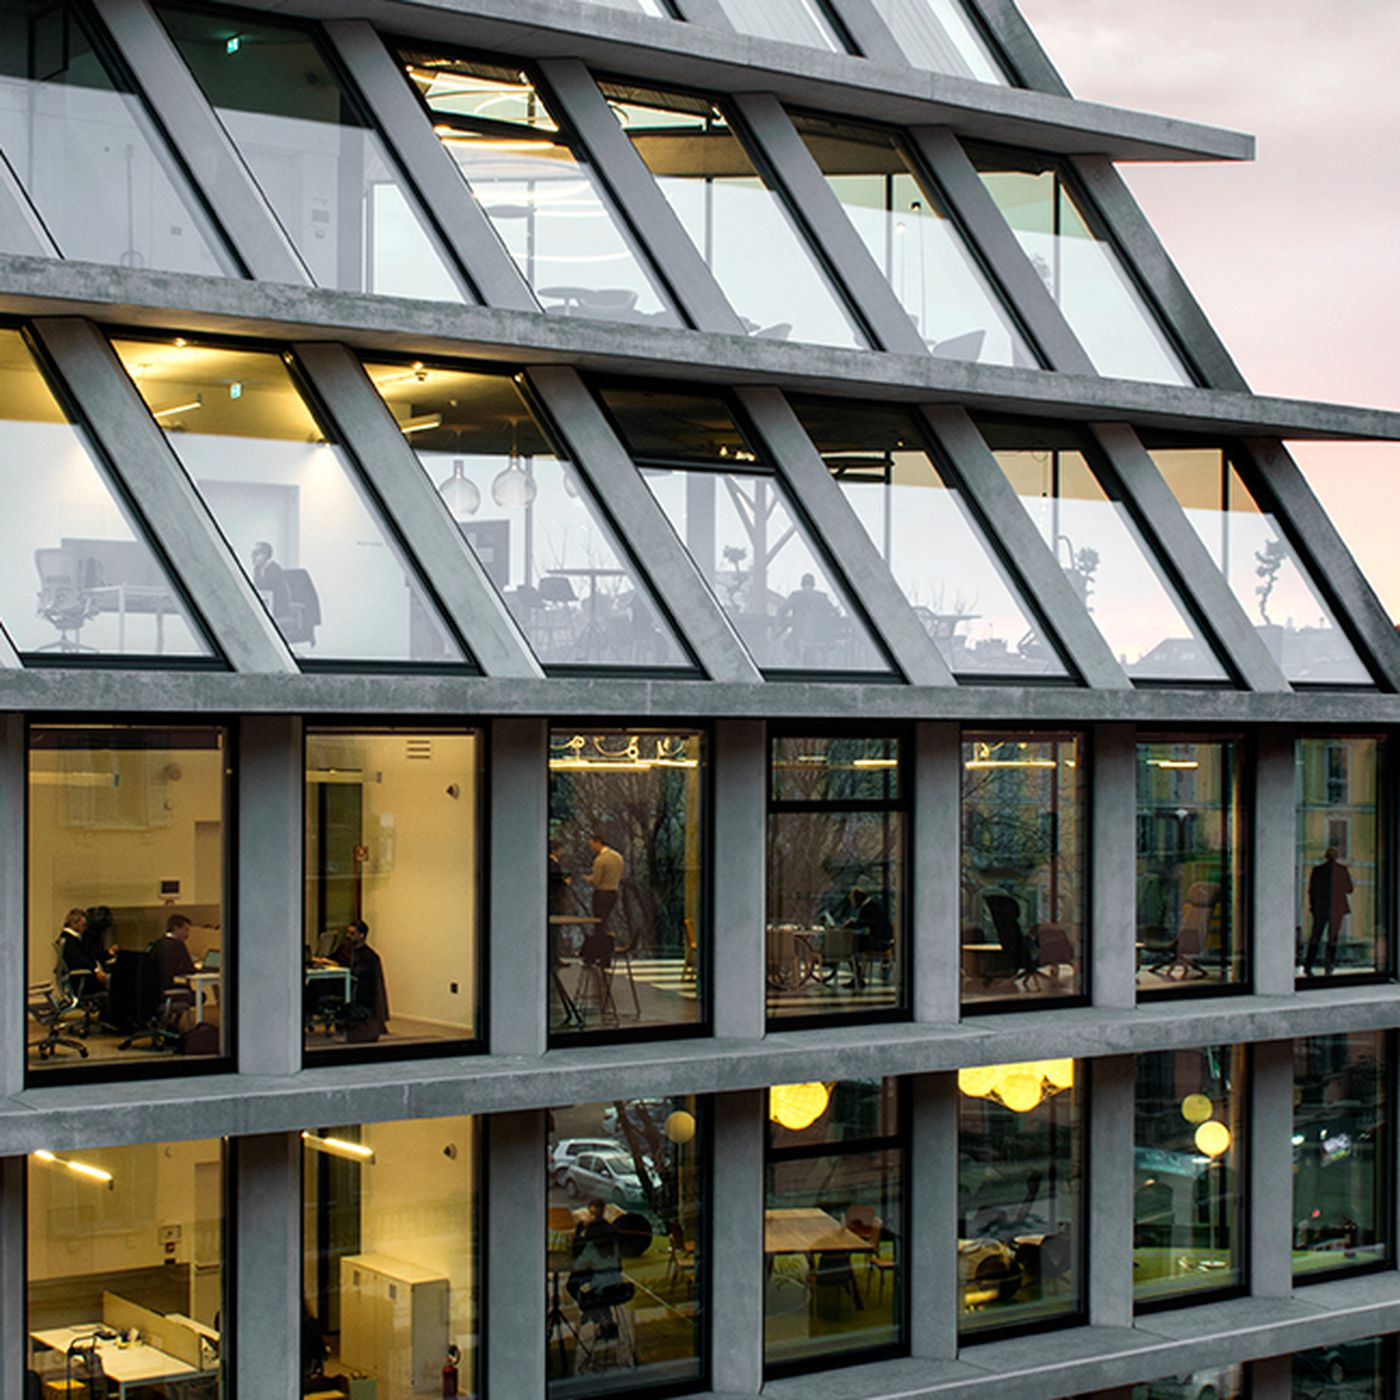 Microsoft moves into Herzog & de Meuron building in Milan - Curbed